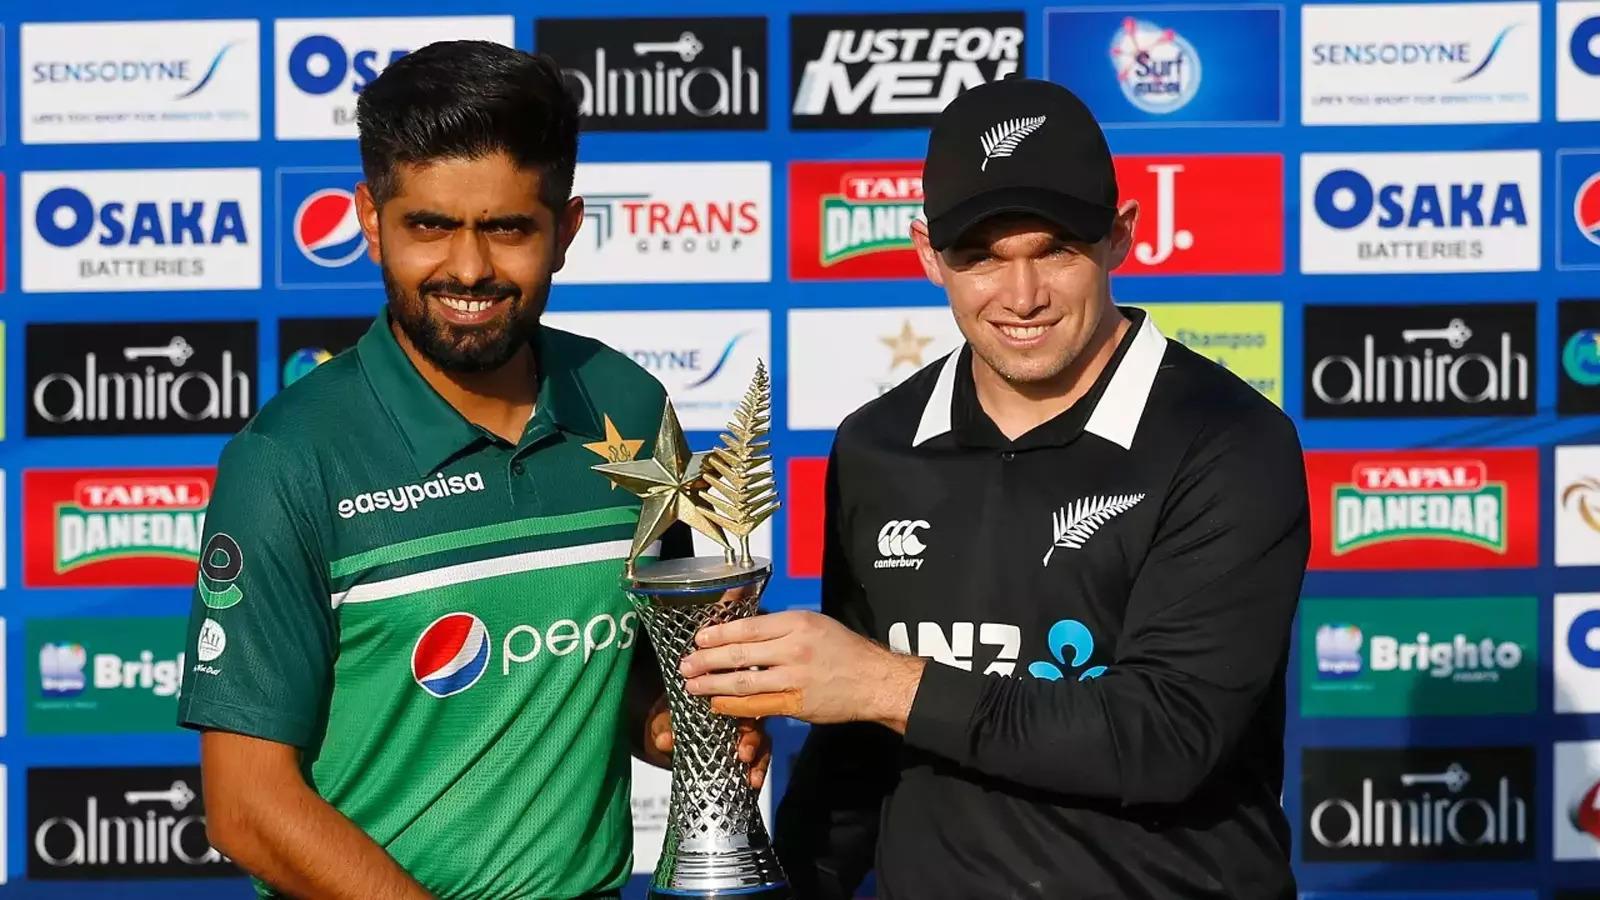 new-zealand-team-abandons-tour-of-pakistan-citing-security-threat